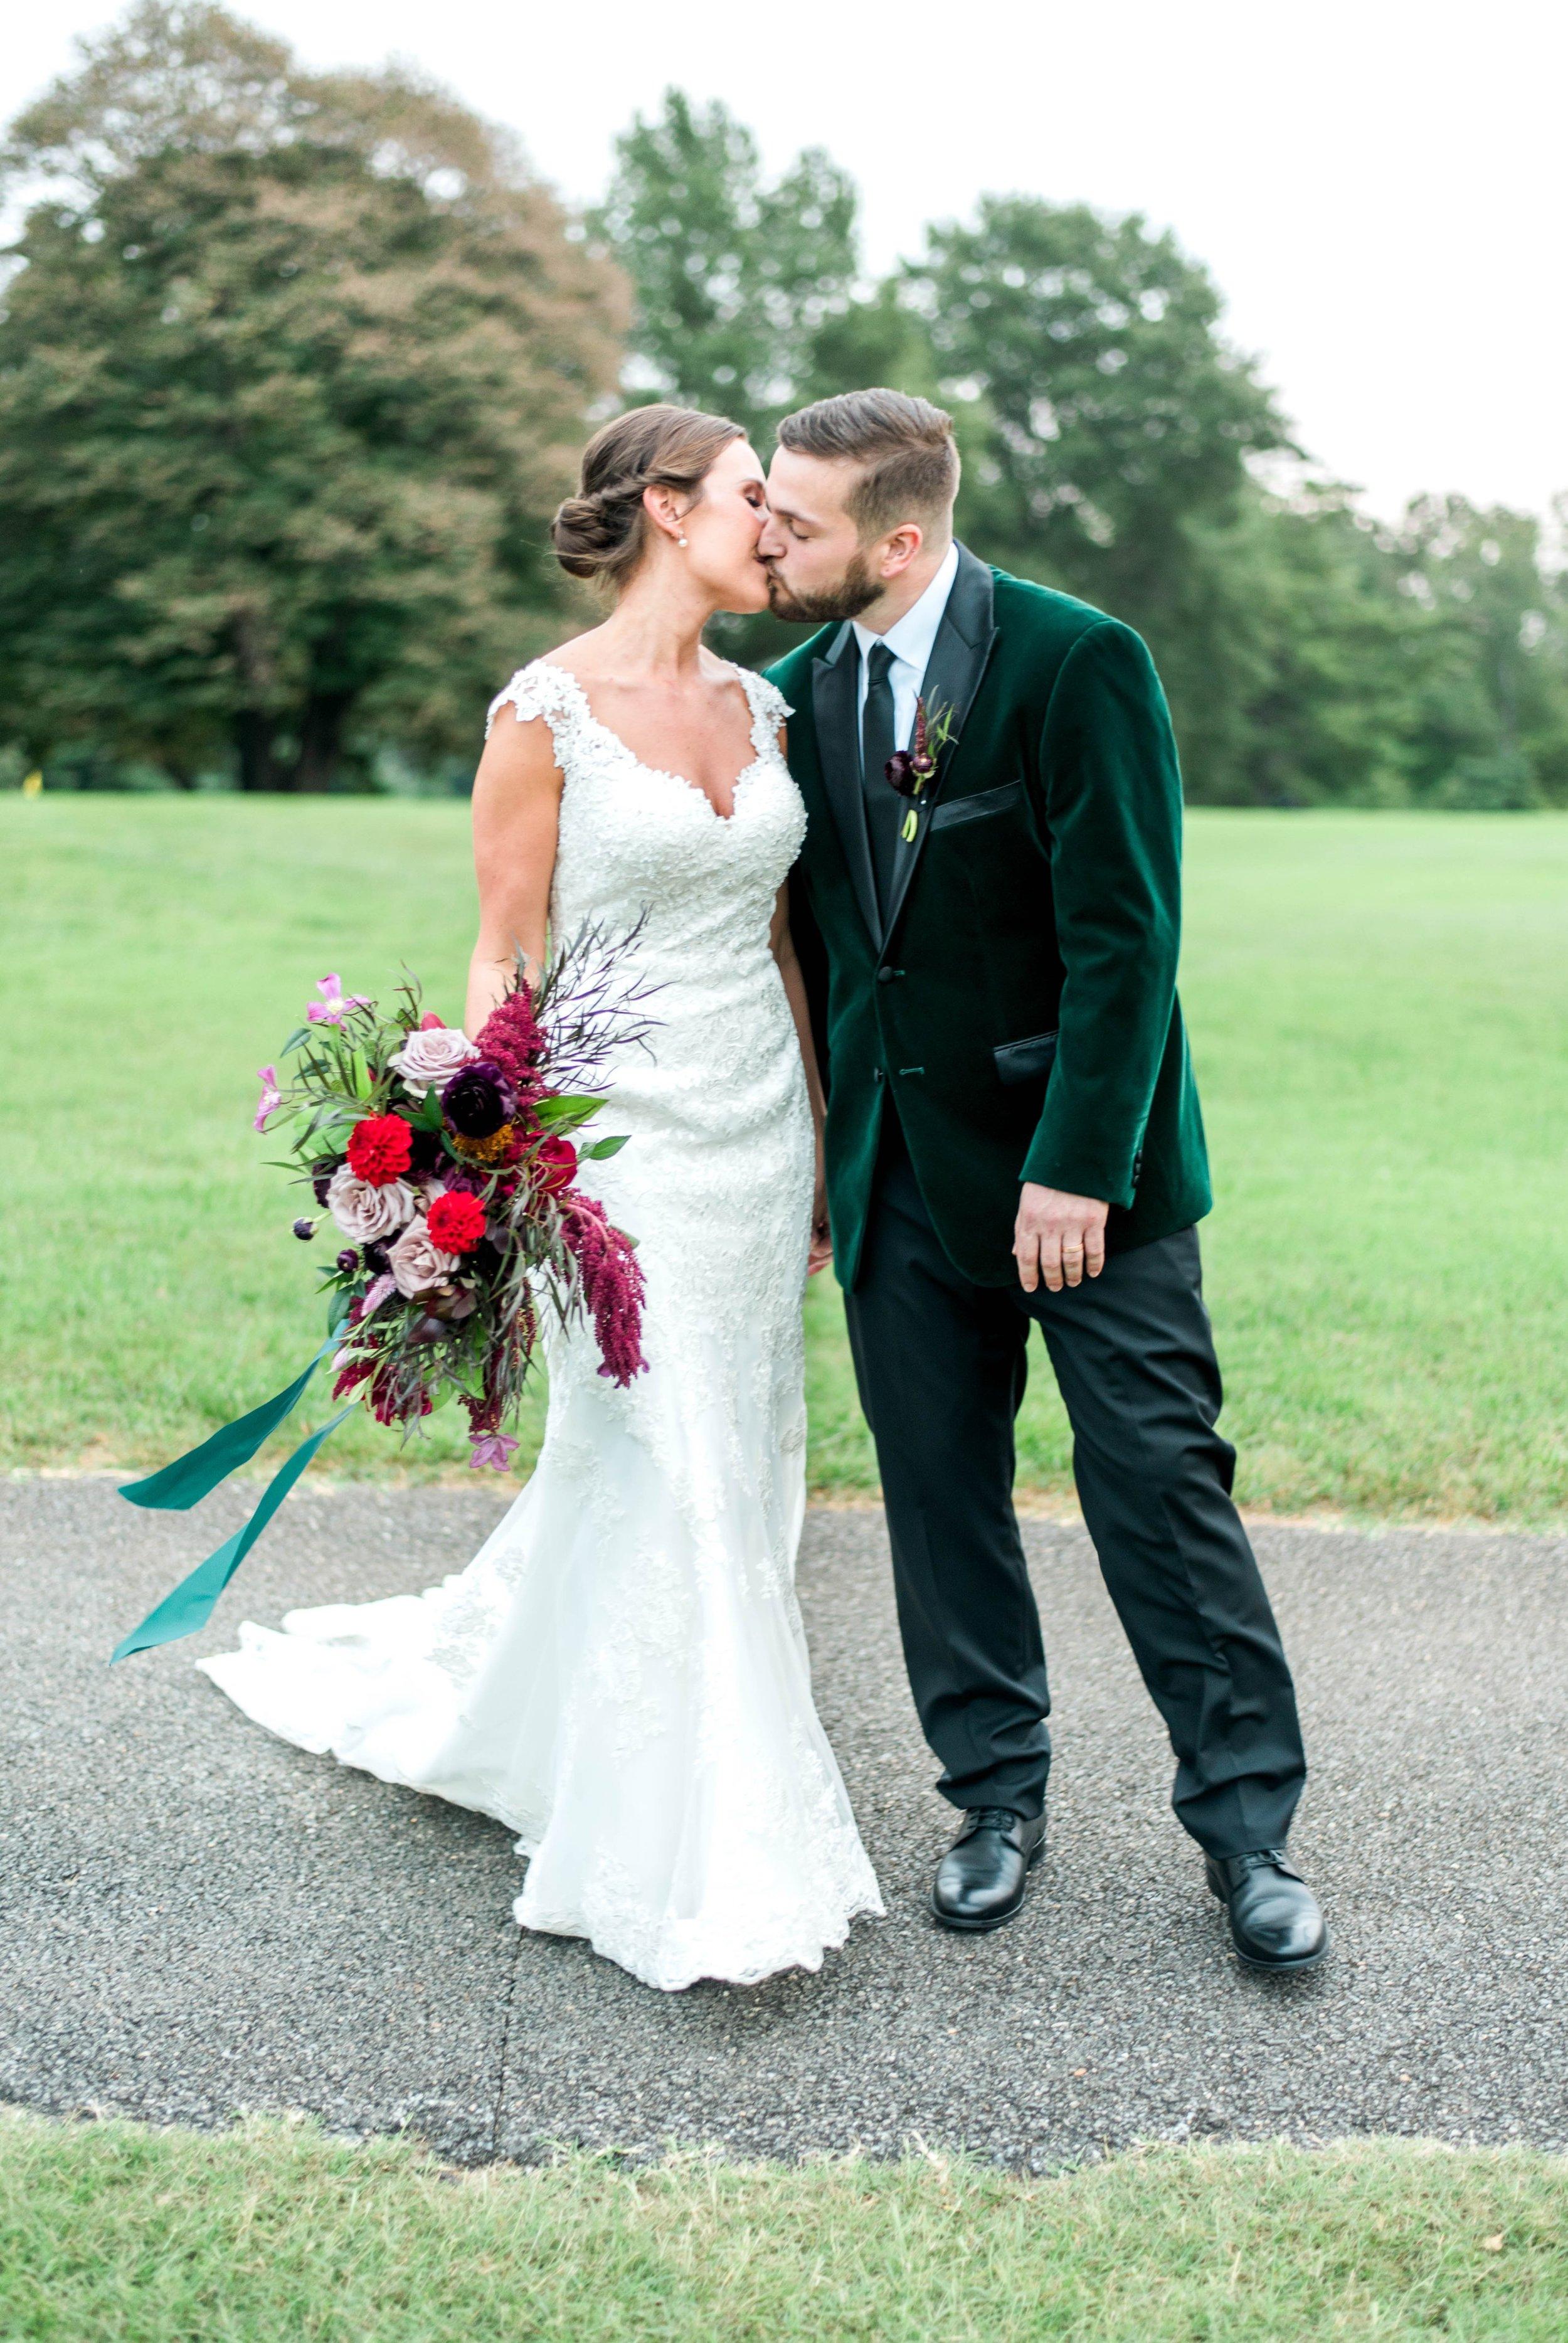 Gordan+Lauren_BoonsboroCountryClubWedding_Virginiaweddingphotographer_LynchburgVi 32.jpg